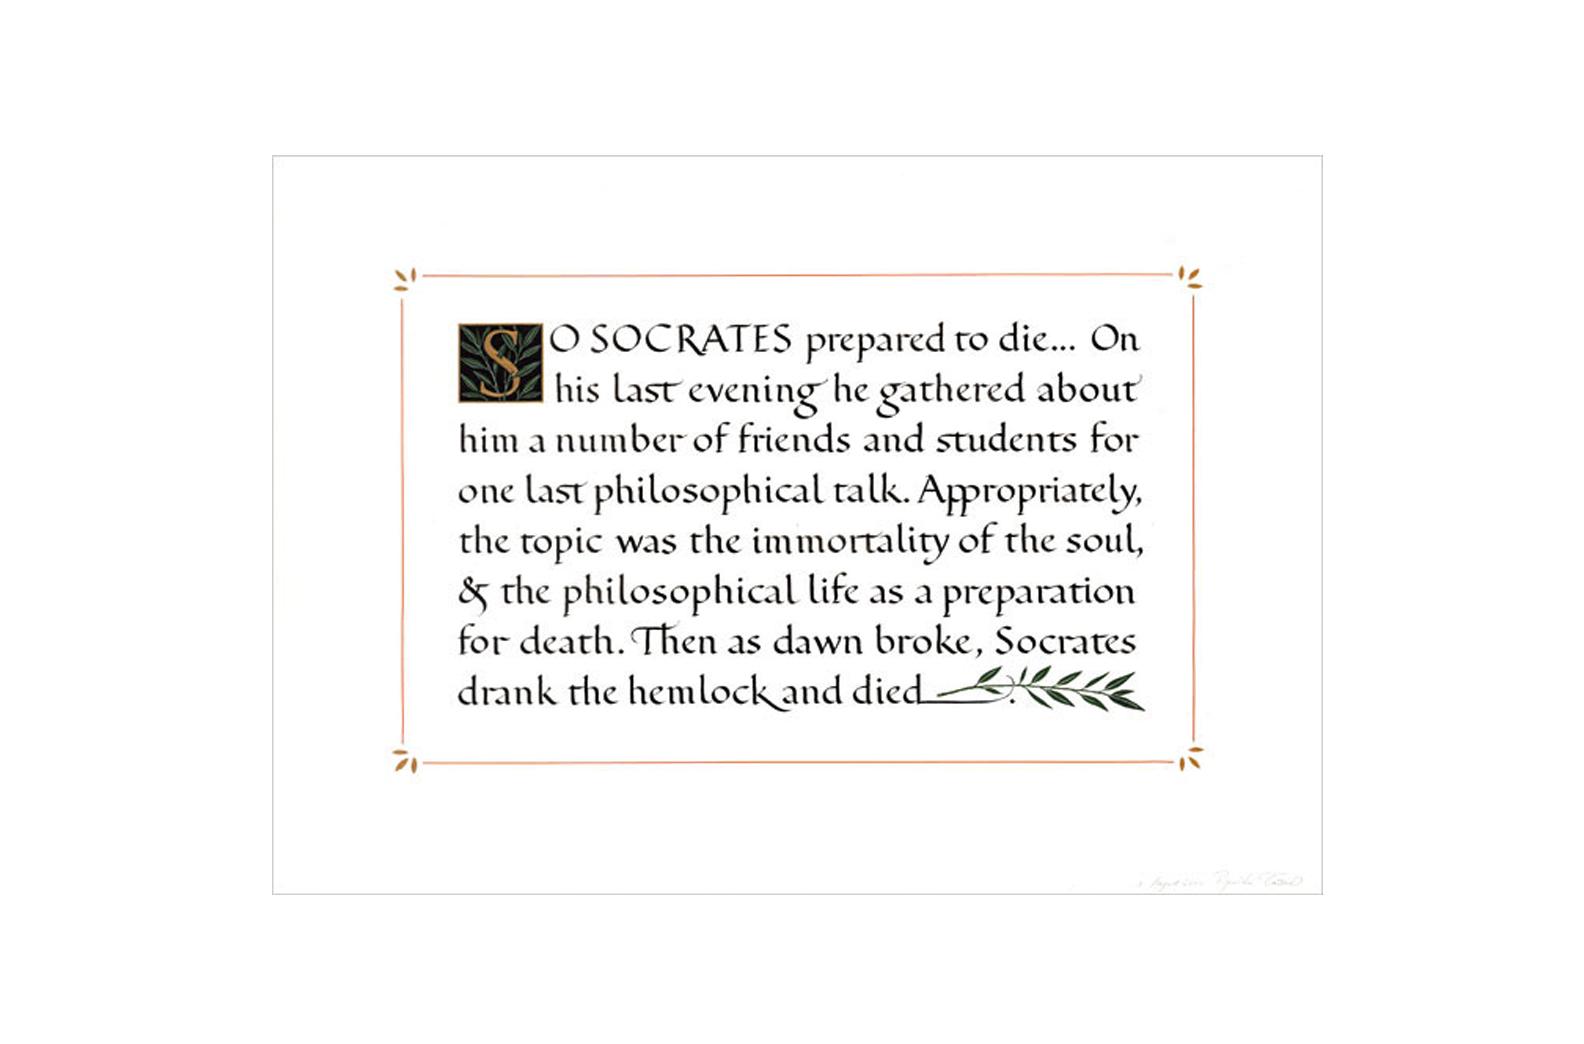 So Socrates